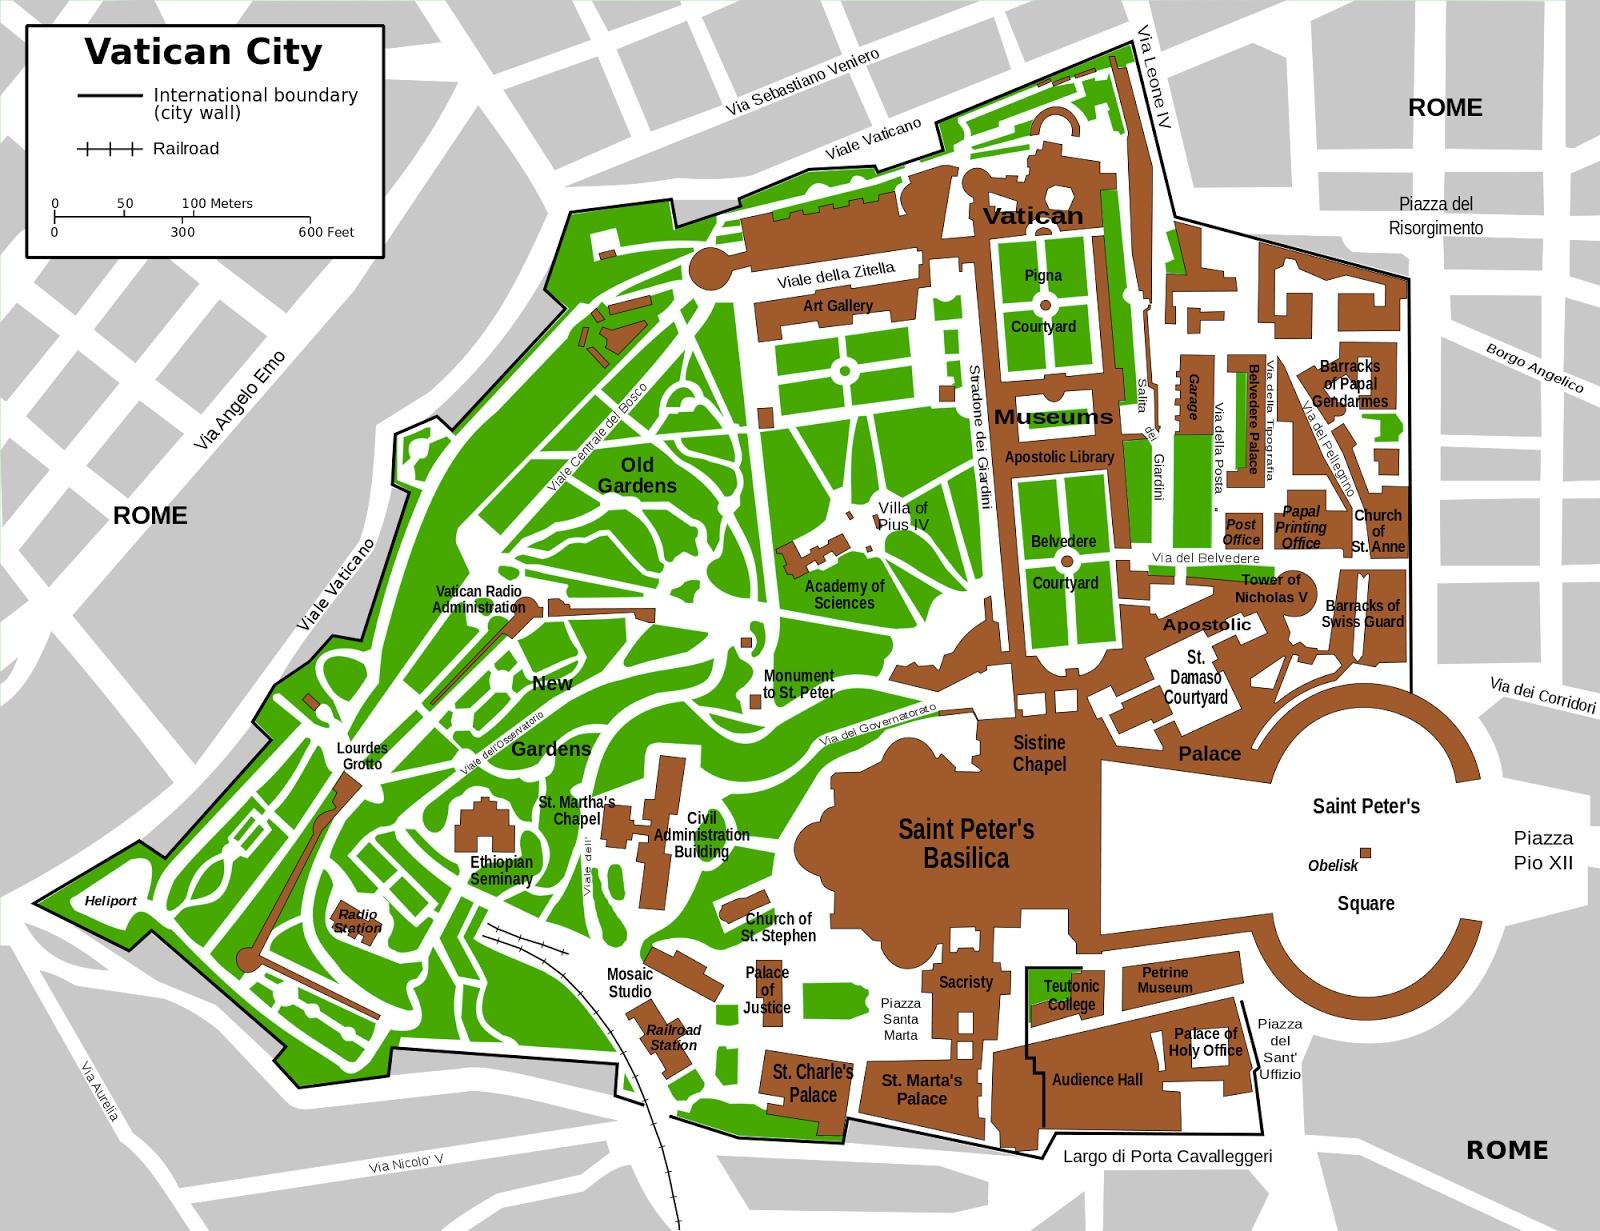 Vatican City tourist map